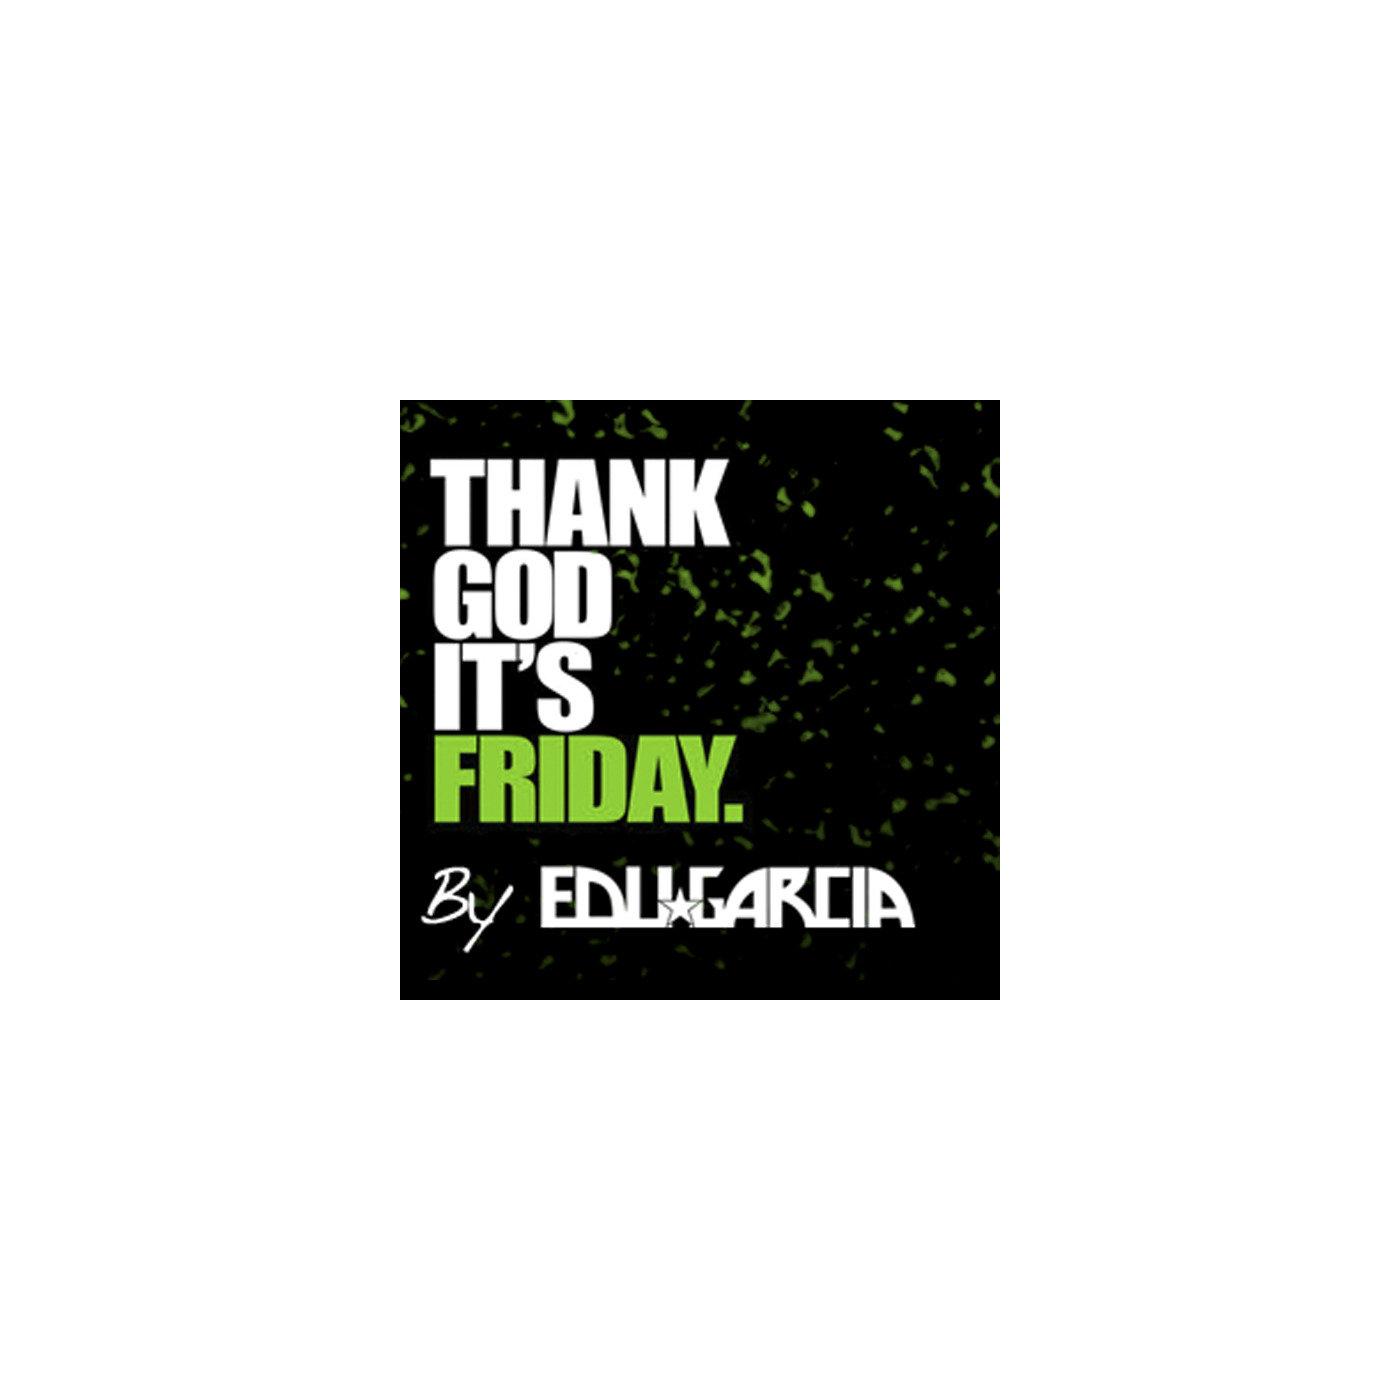 <![CDATA[Thank God it's Friday by Eduardo Garcia ]]>